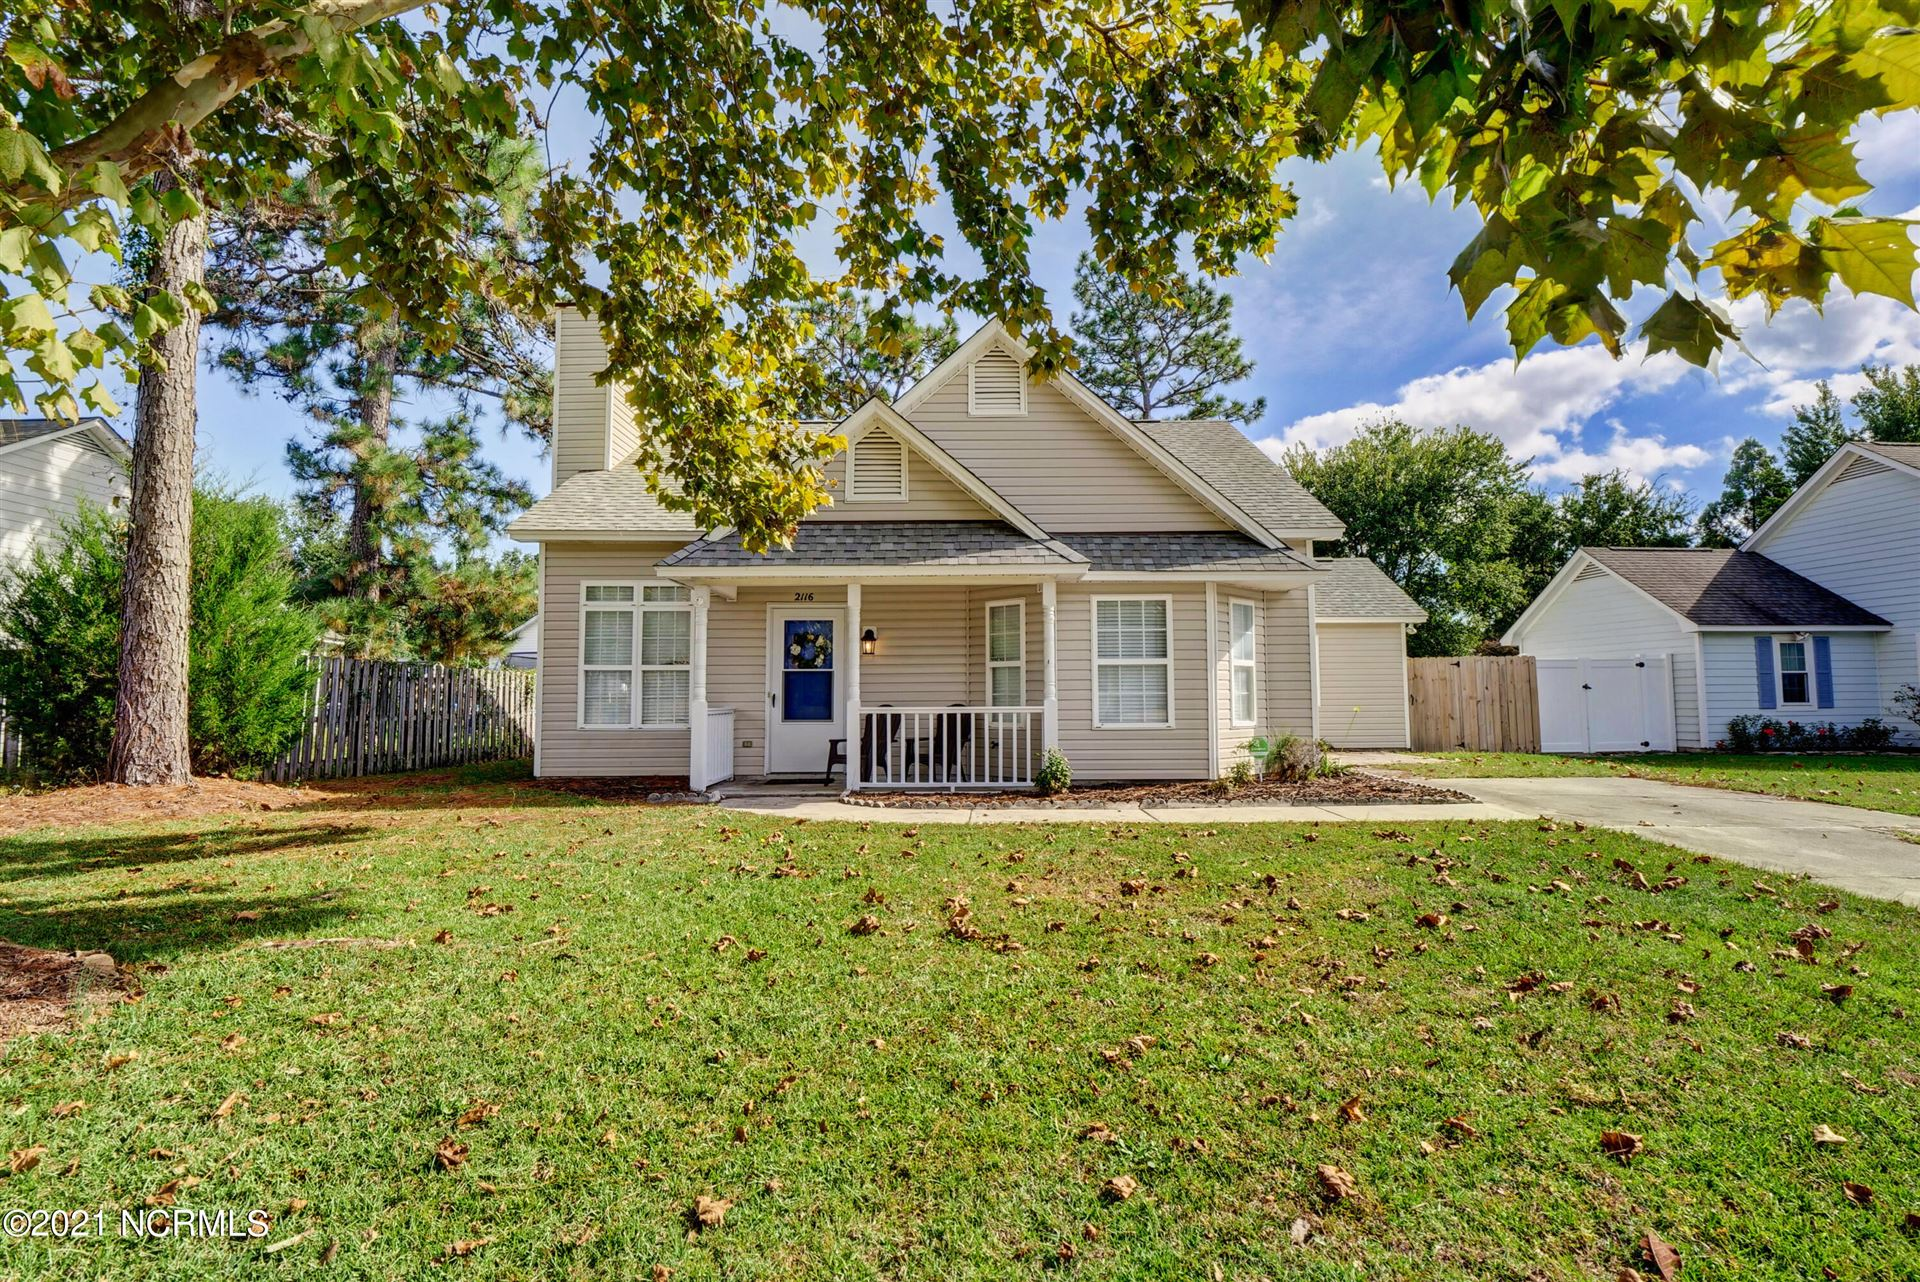 Photo of 2116 White Road, Wilmington, NC 28411 (MLS # 100295038)